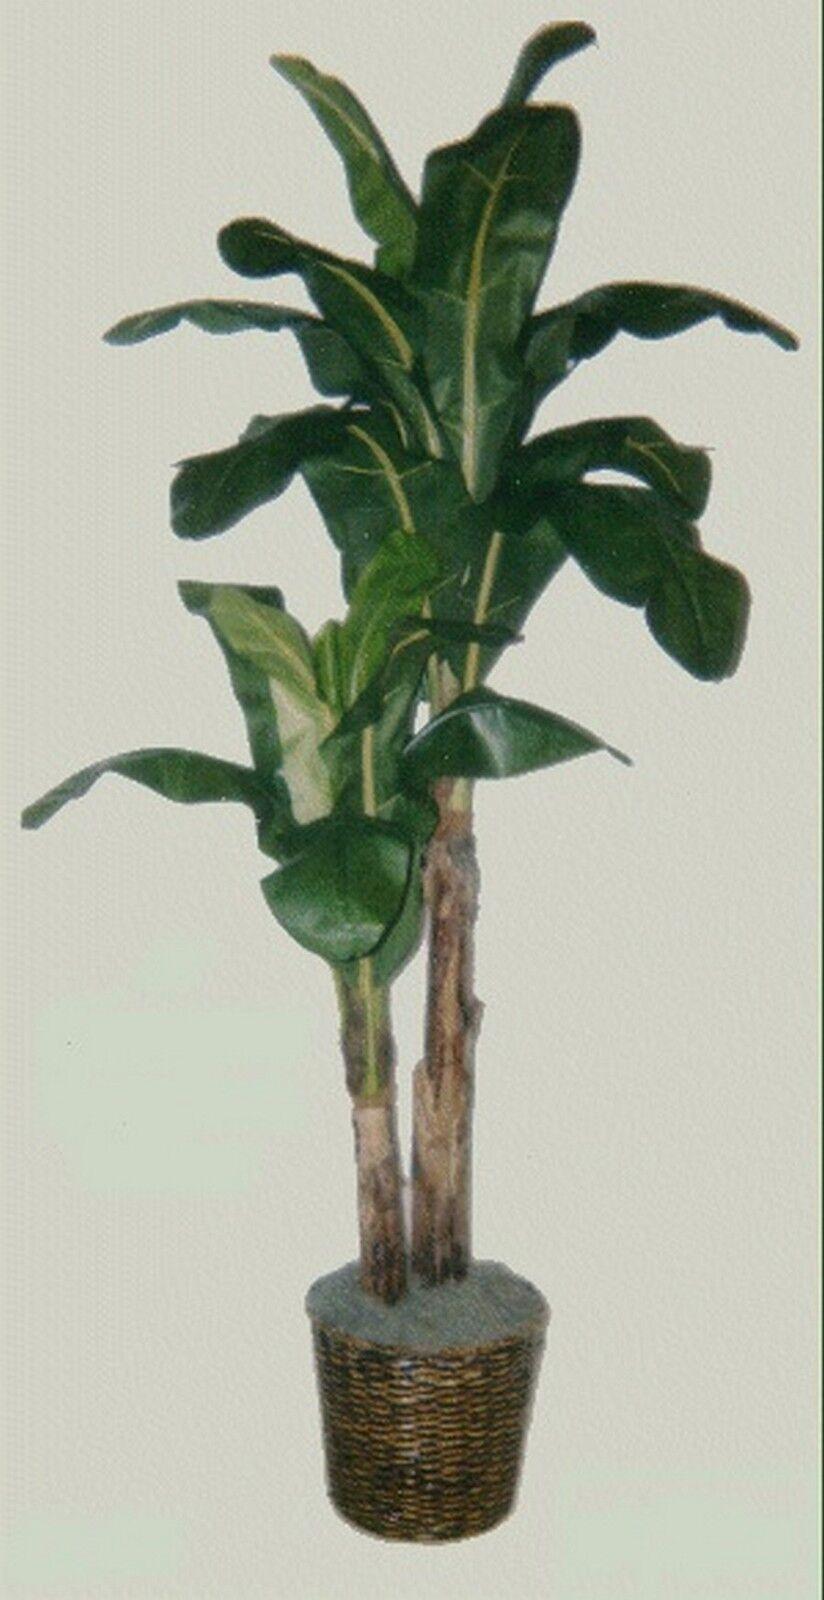 8 Banana Palm Artificial Silk Tree Plant Topiary Basket Arrangement